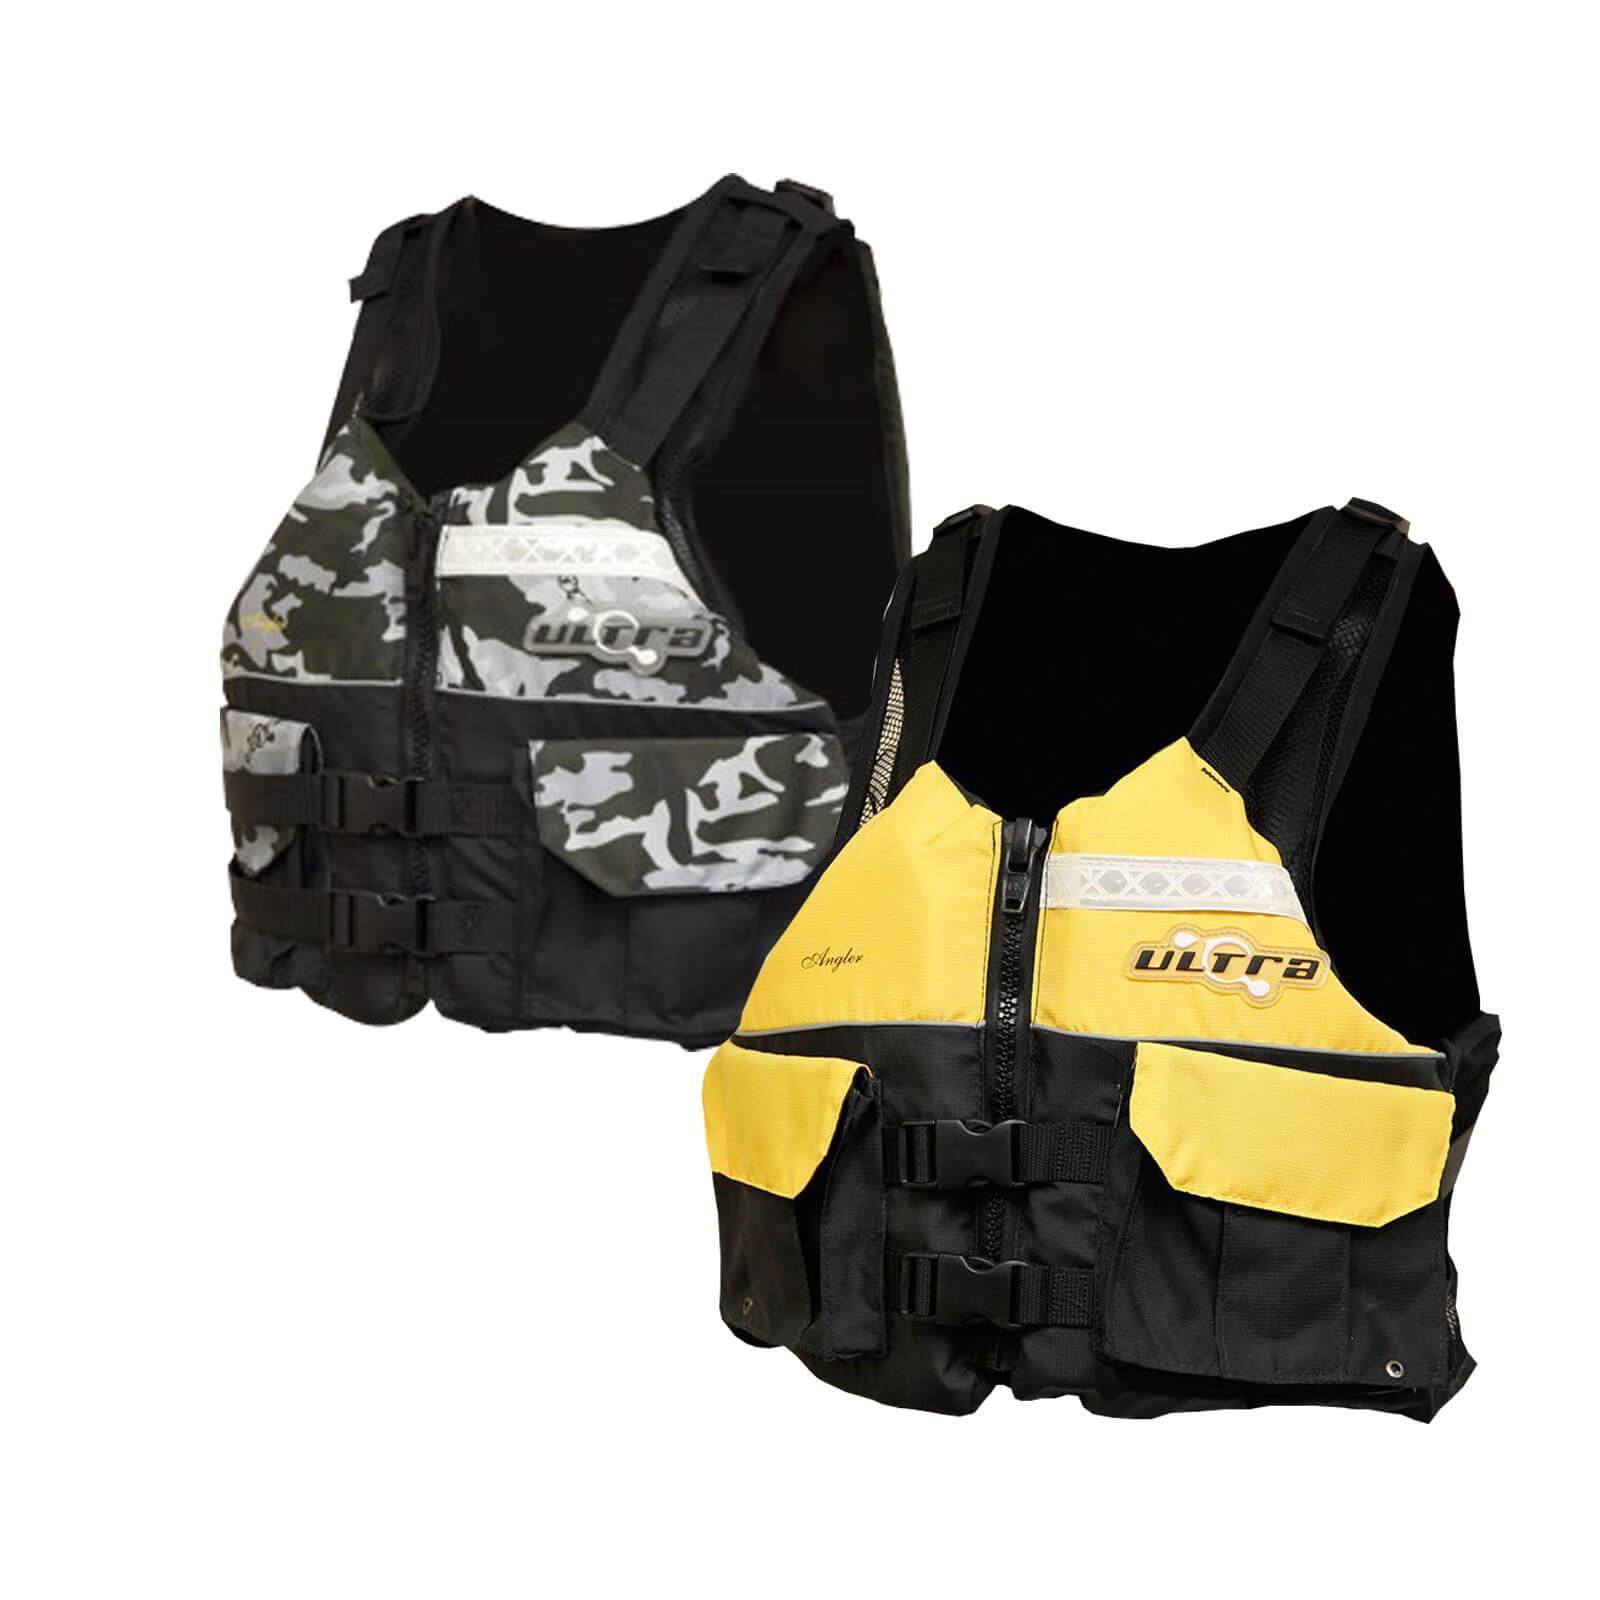 Kayak Life Jackets PFD L50s Ultra Angler